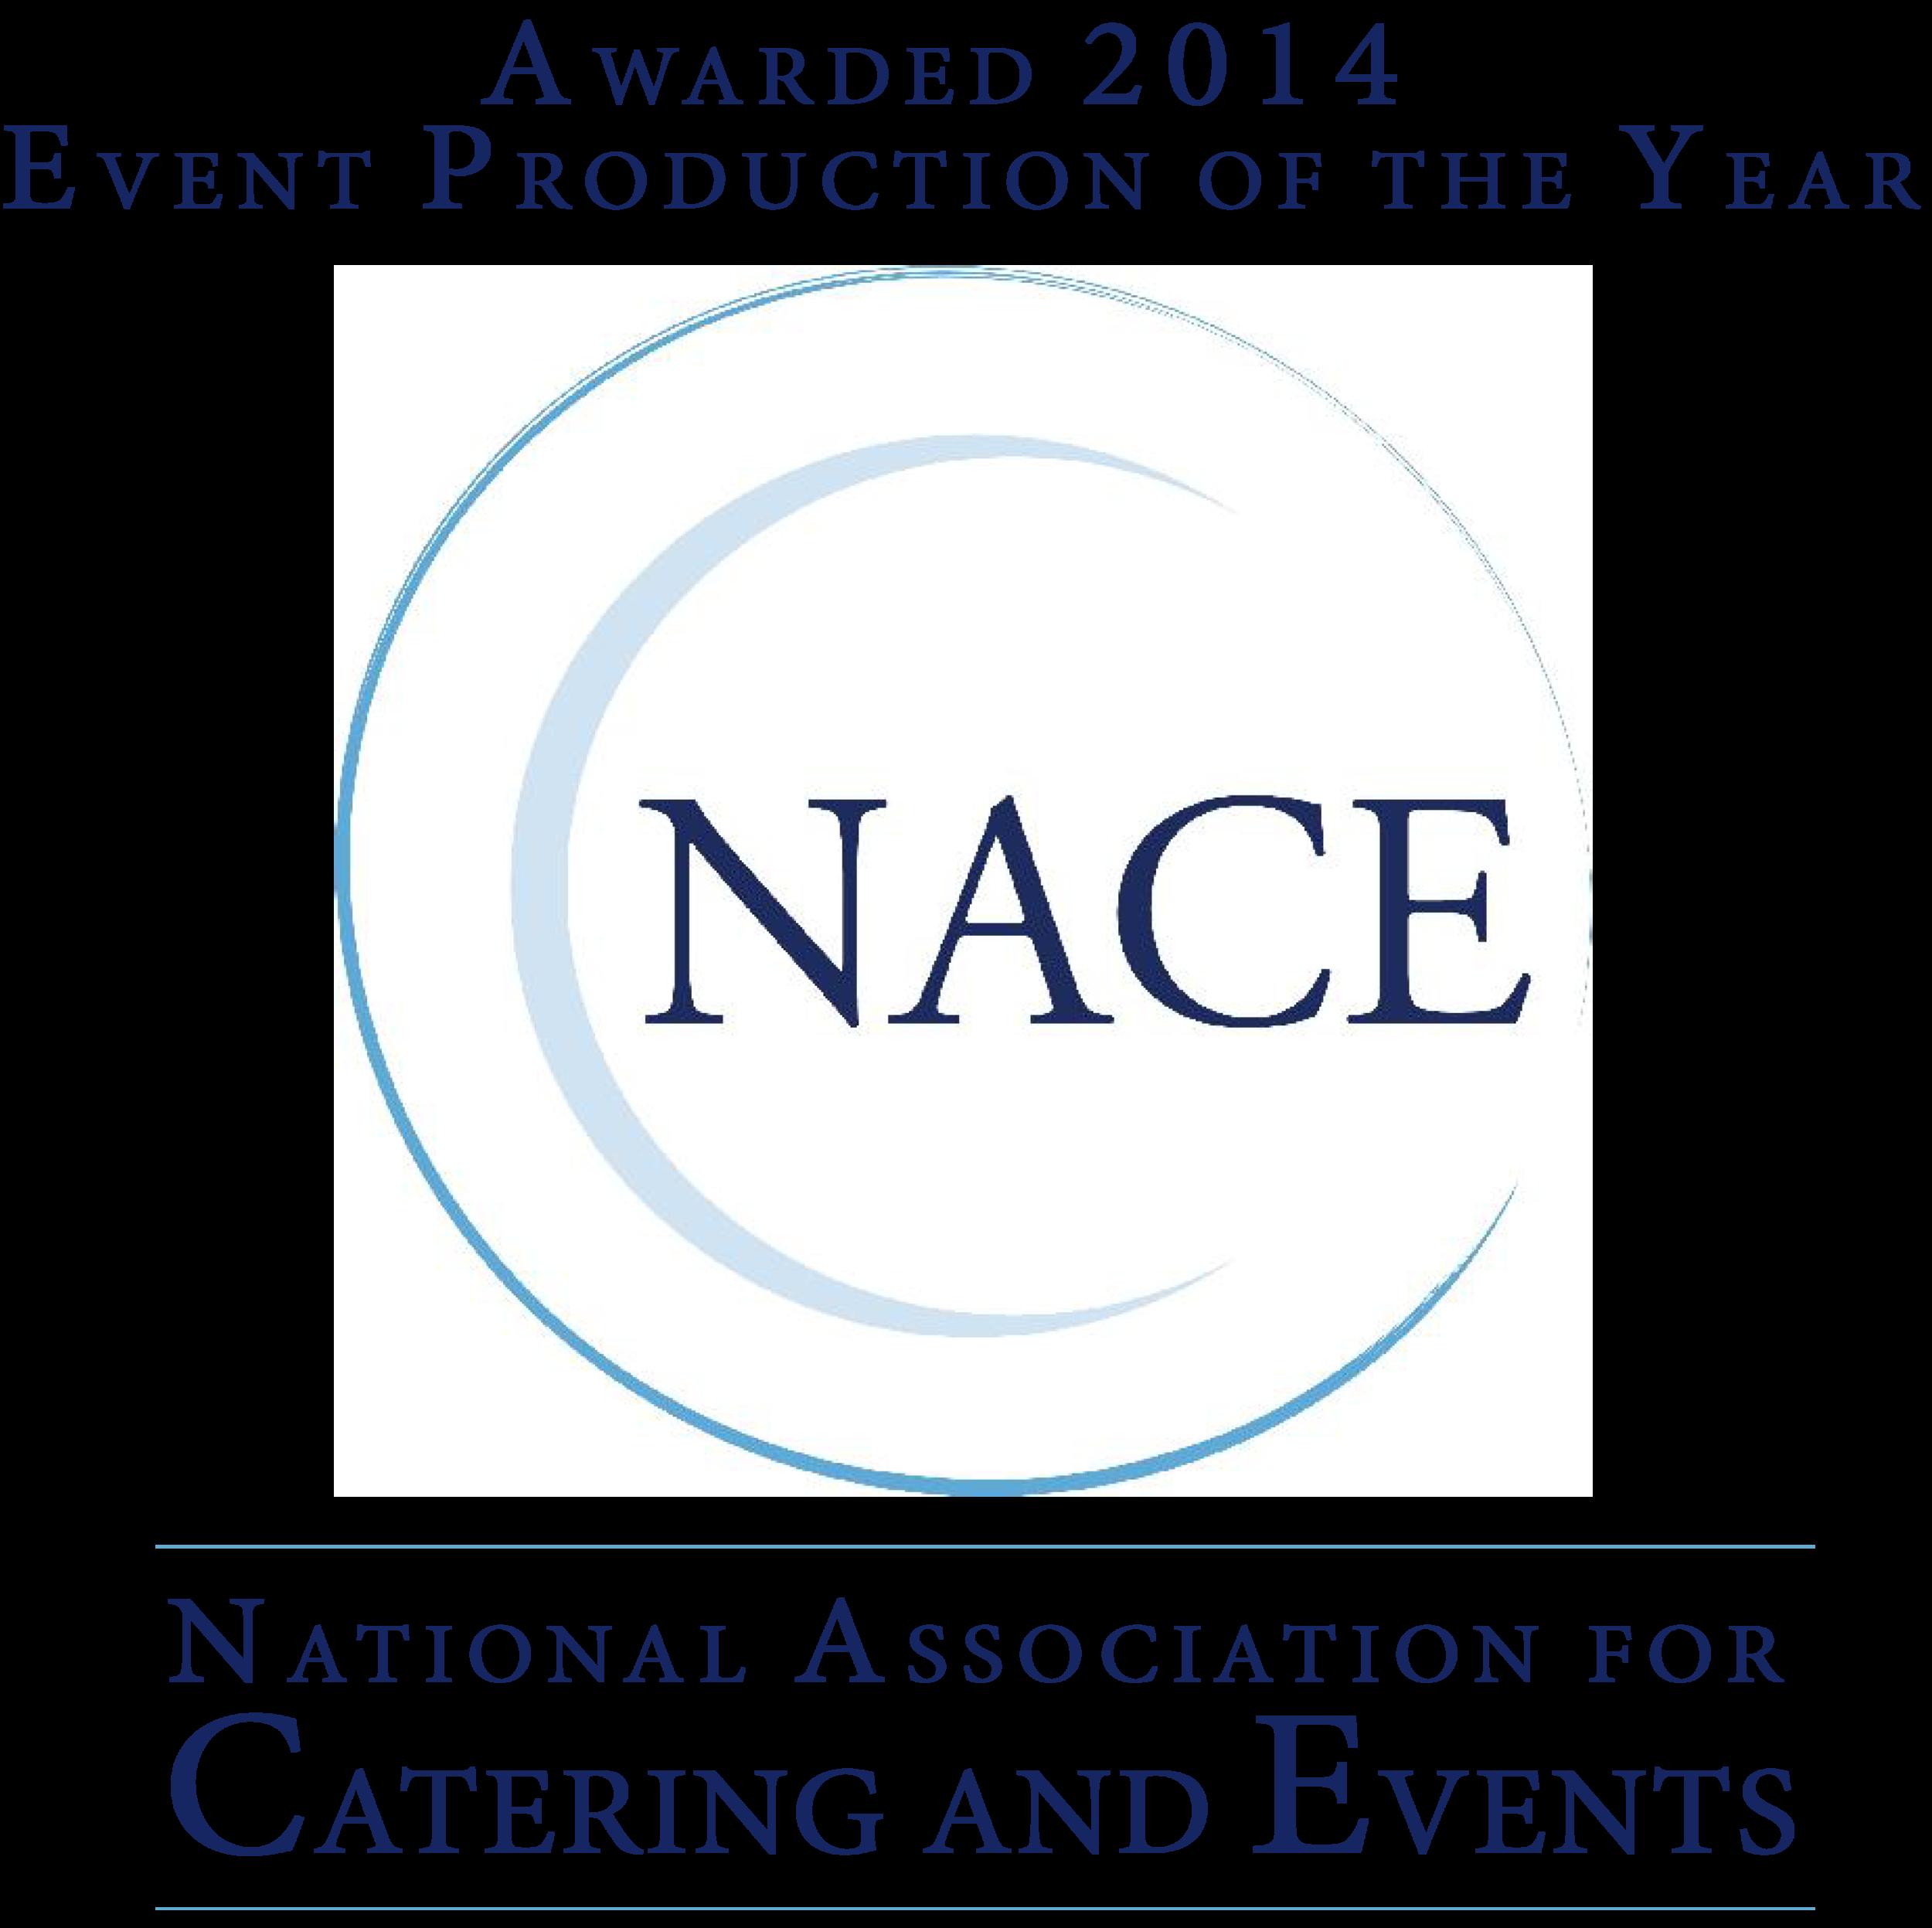 NACE Logo_National Award Winner.png